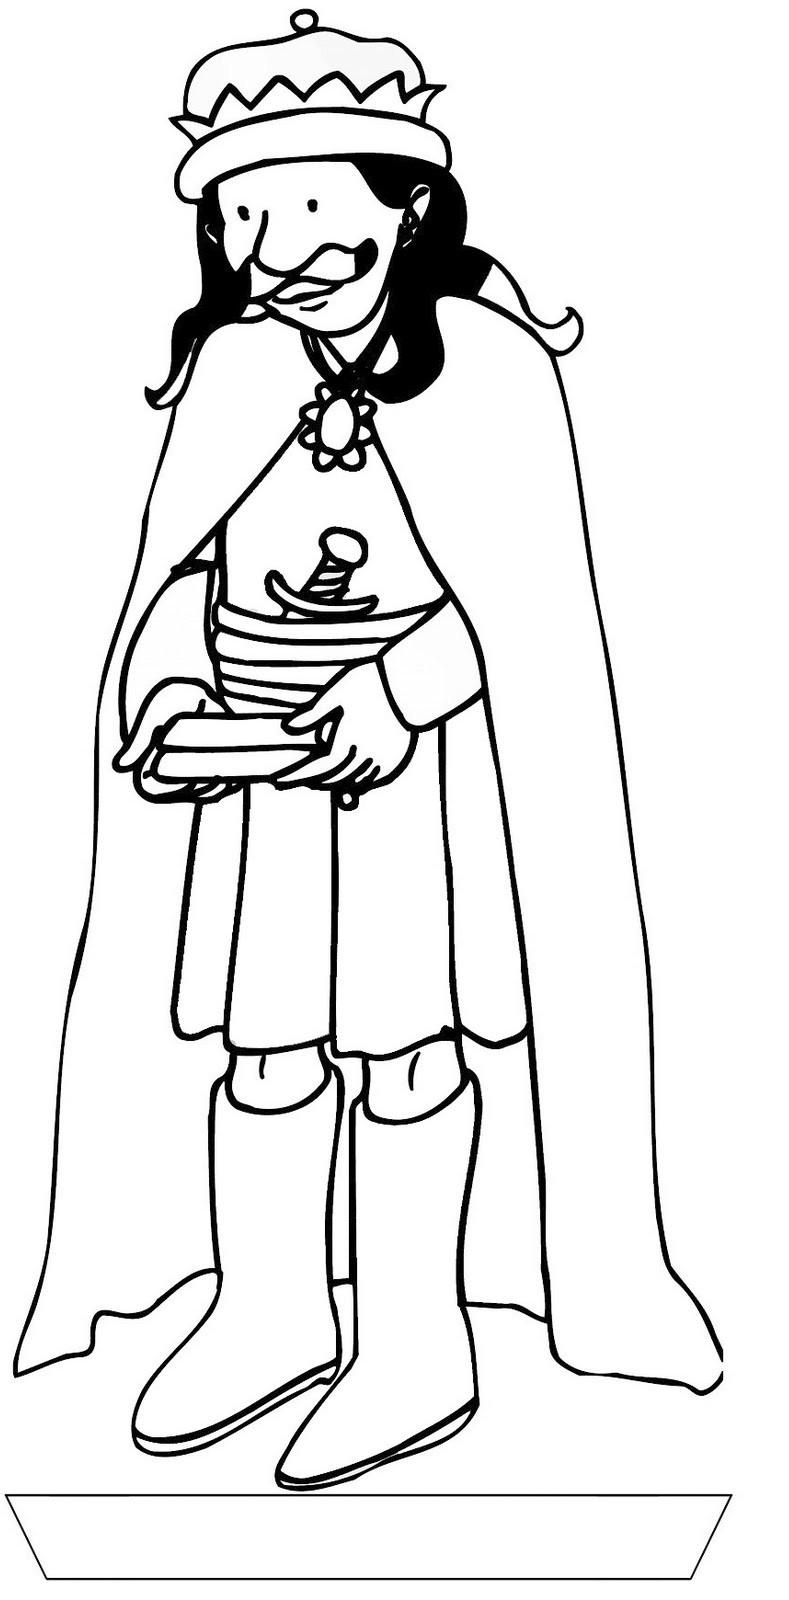 Wise Man Coloring Page Biblical Magi Three Kings Wise Worship Coloring Page